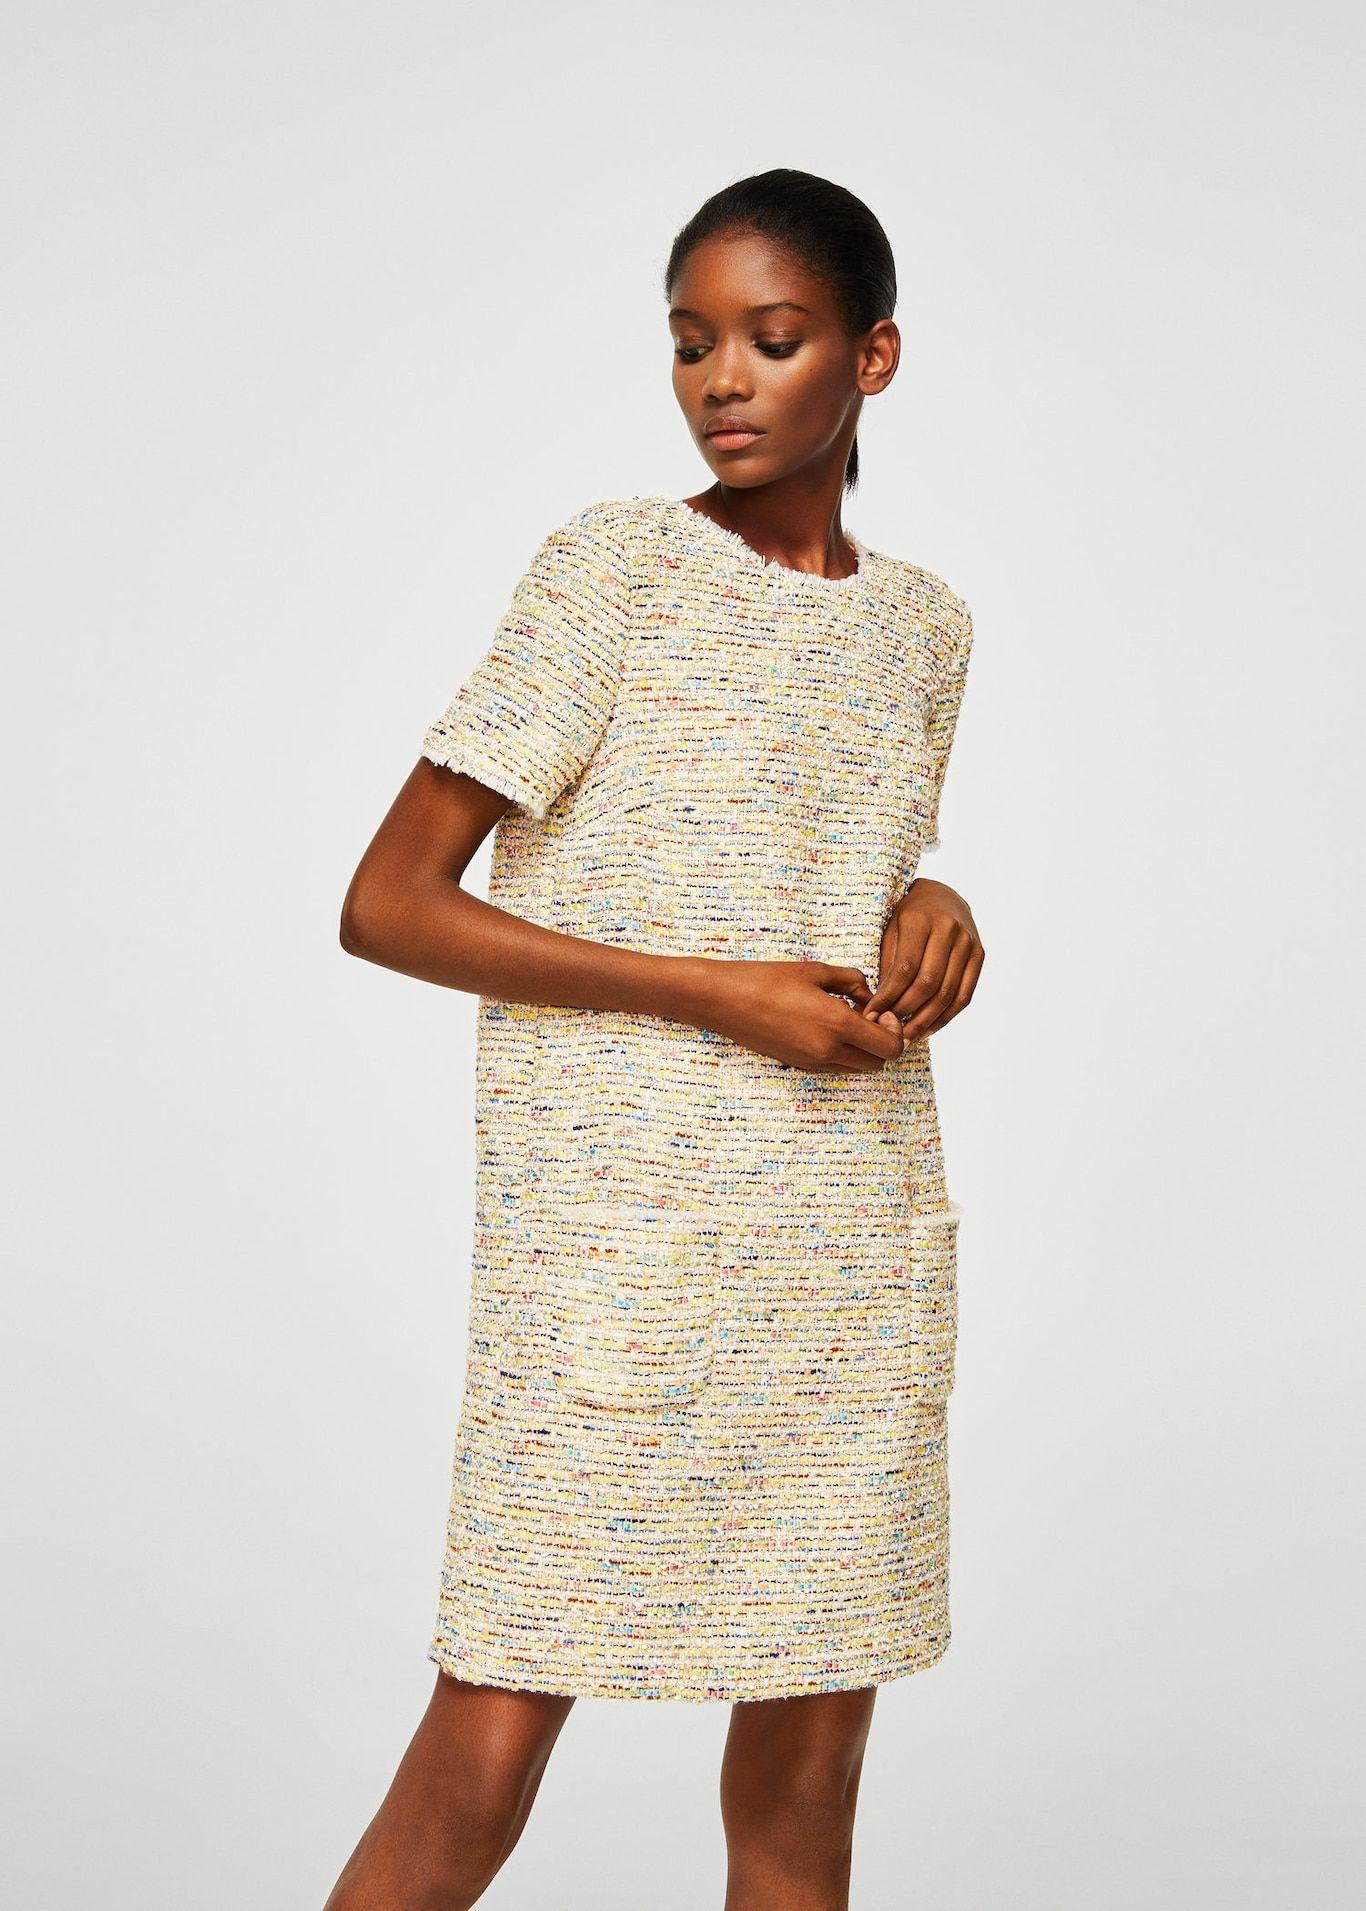 Robe tweed à poches - Femme   mode   Pinterest   Tweed, Robe et ... fb17c0169d21